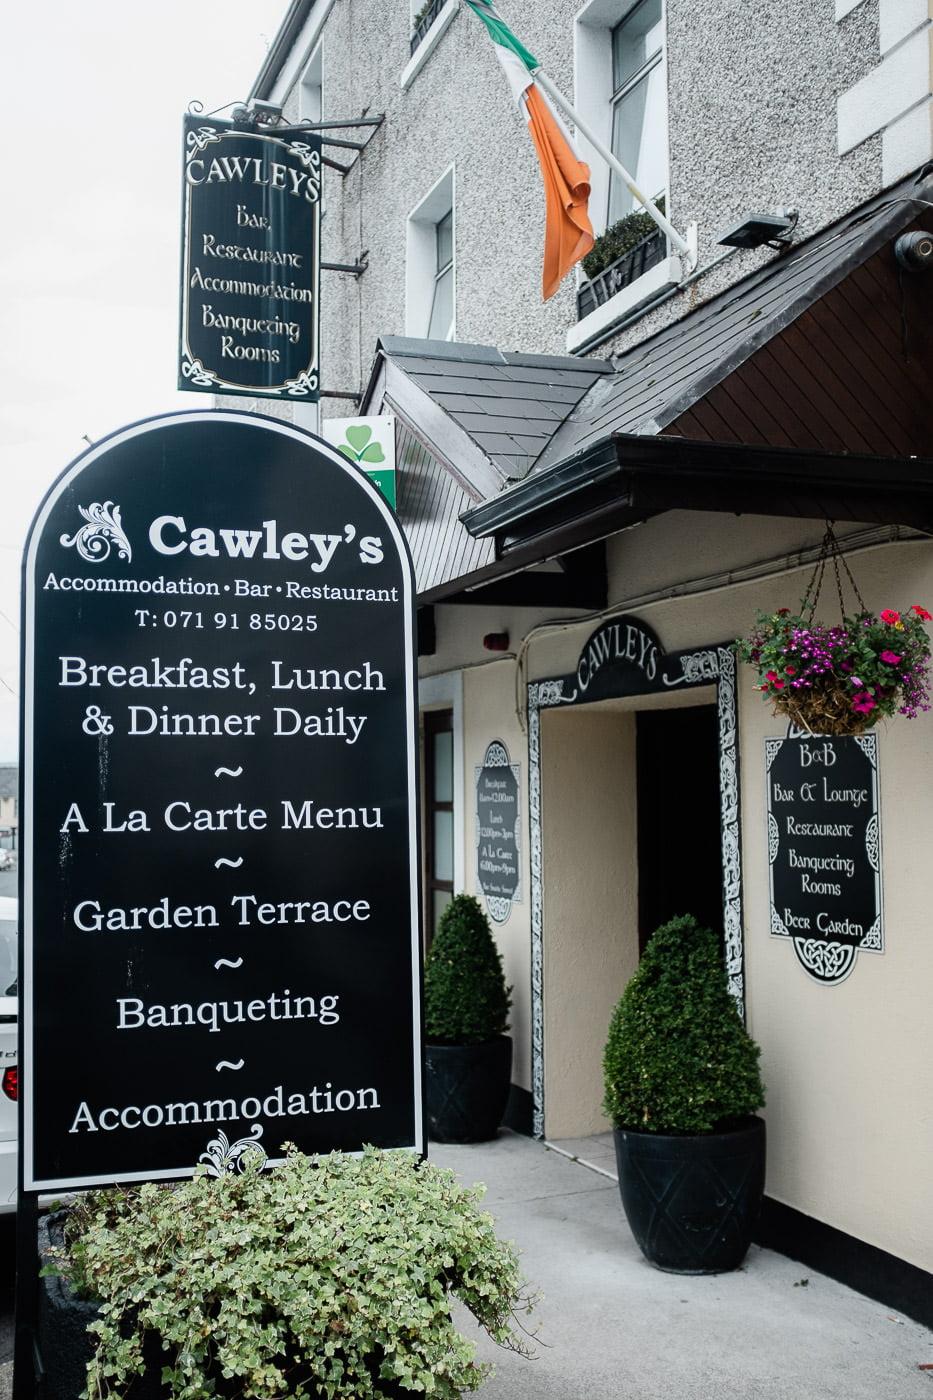 cawleys hotel sligo